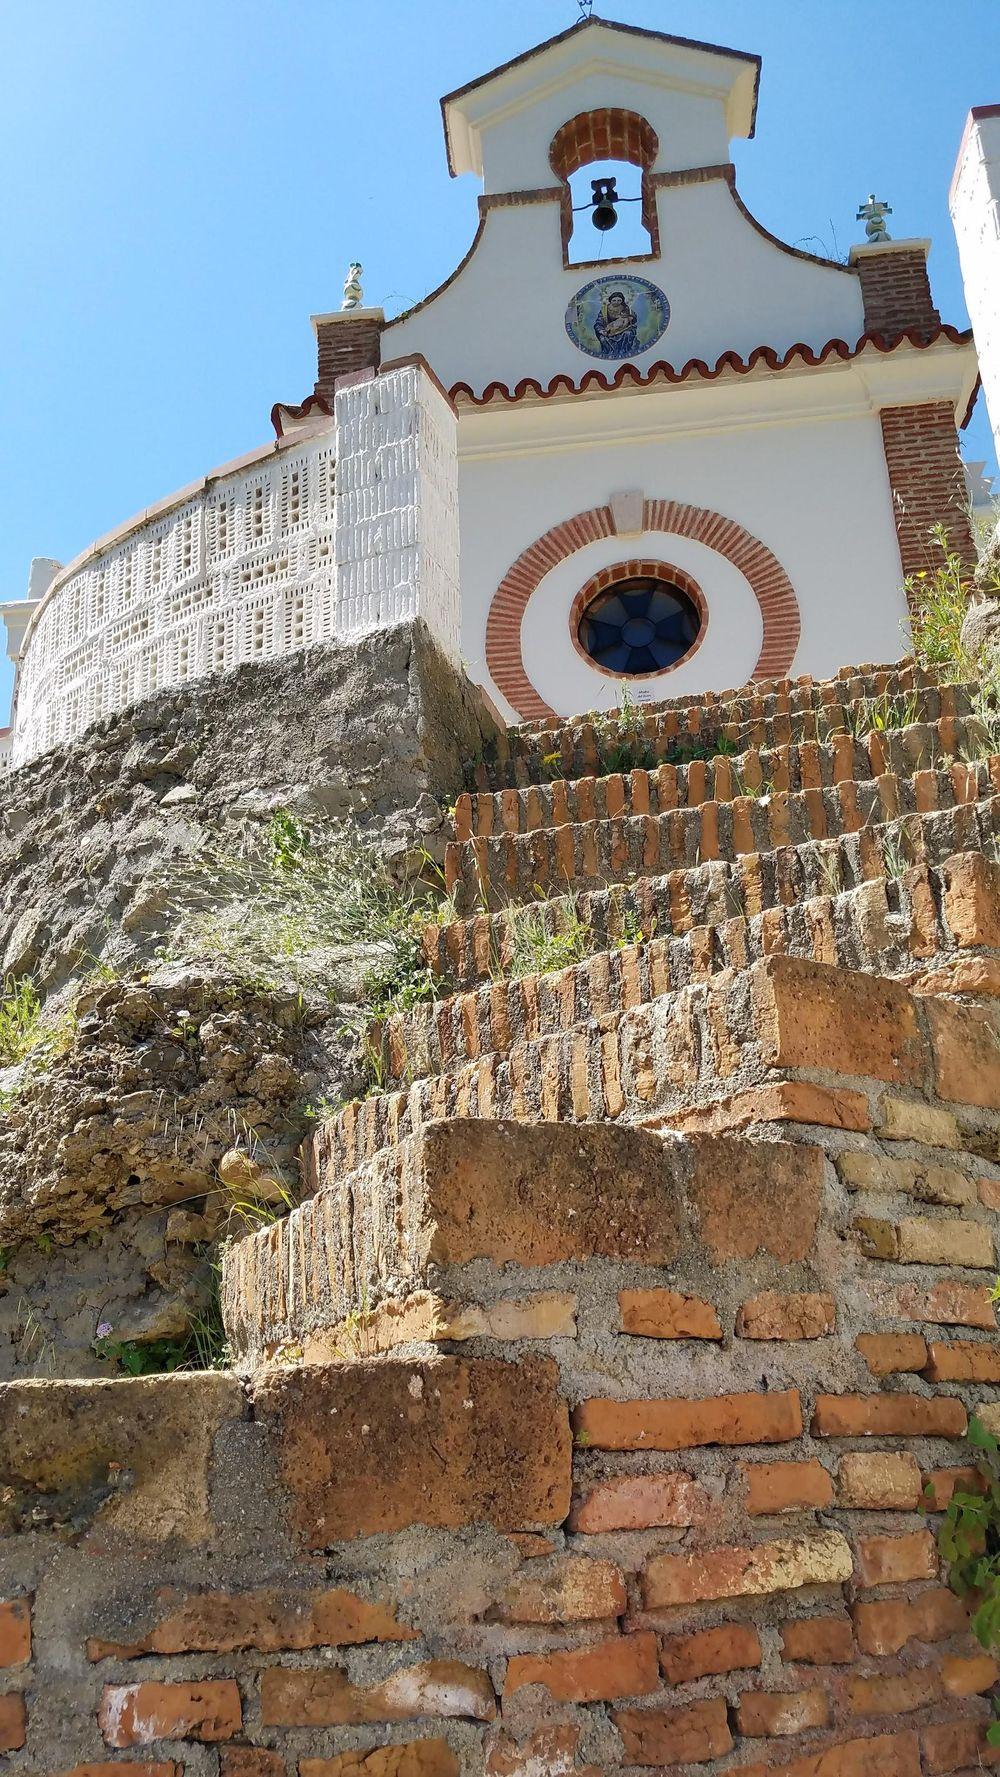 El Chorro, Spain - church - image 1 - student project